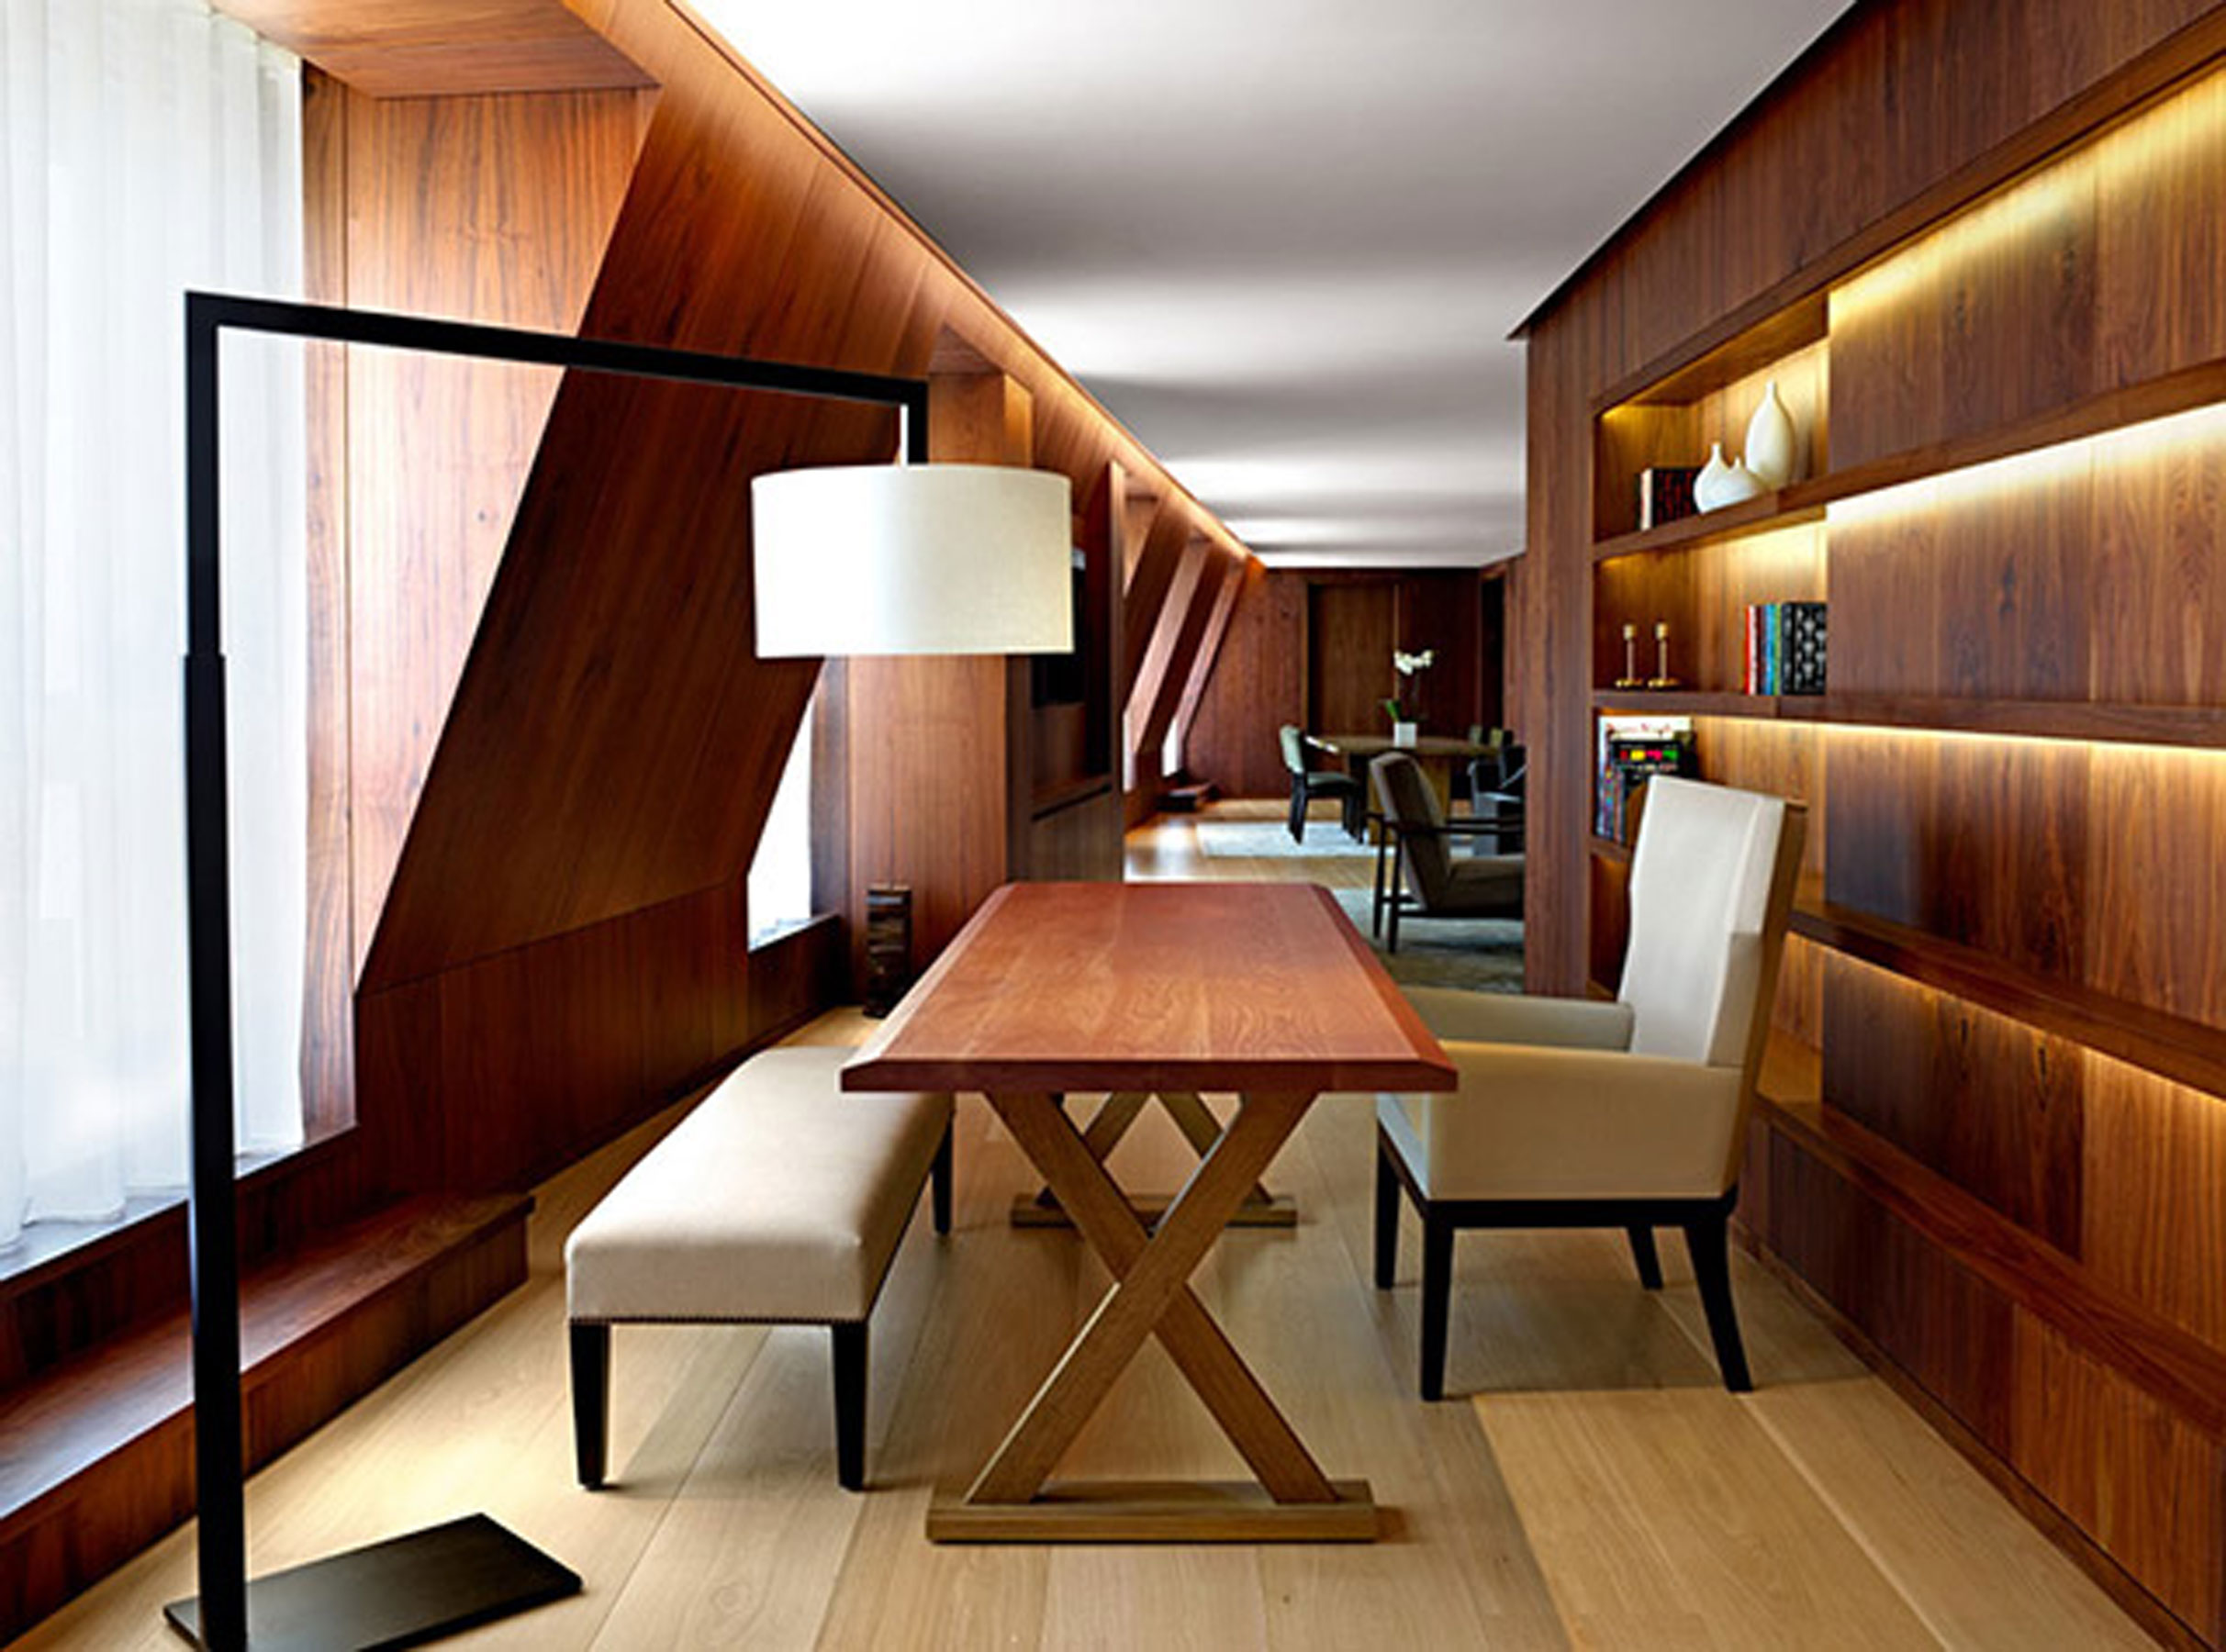 yabu-pushelberg-ian-schrager-the-london-edition-hotel-designboom-g19.jpg